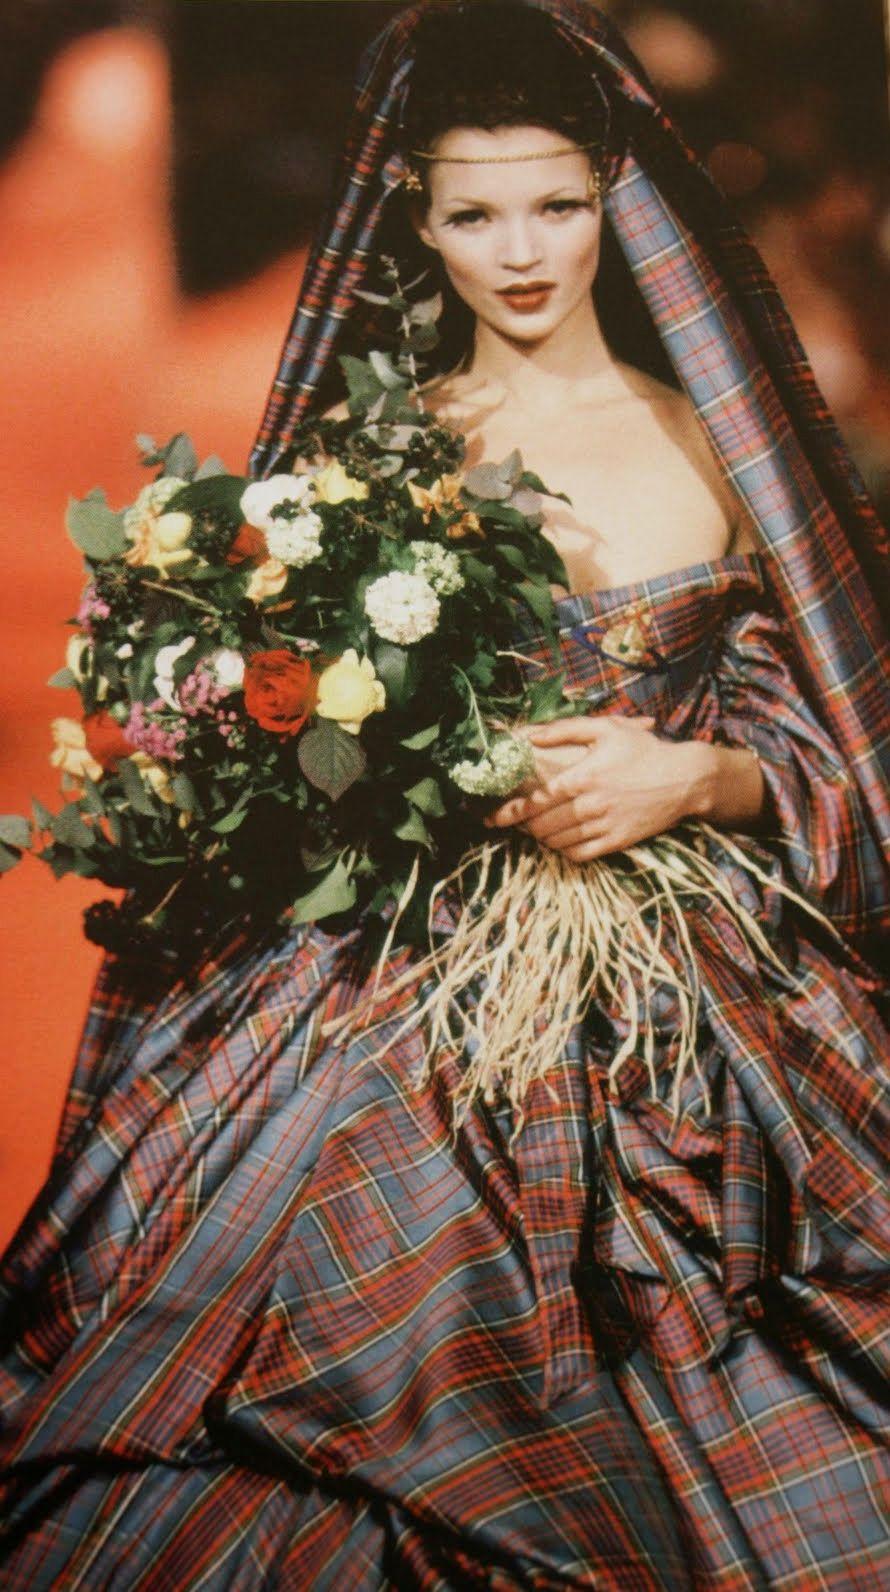 Scottish tartan wedding dress  vivienne westwood uanglomaniau   VIVIENNE WESTWOOD  Pinterest